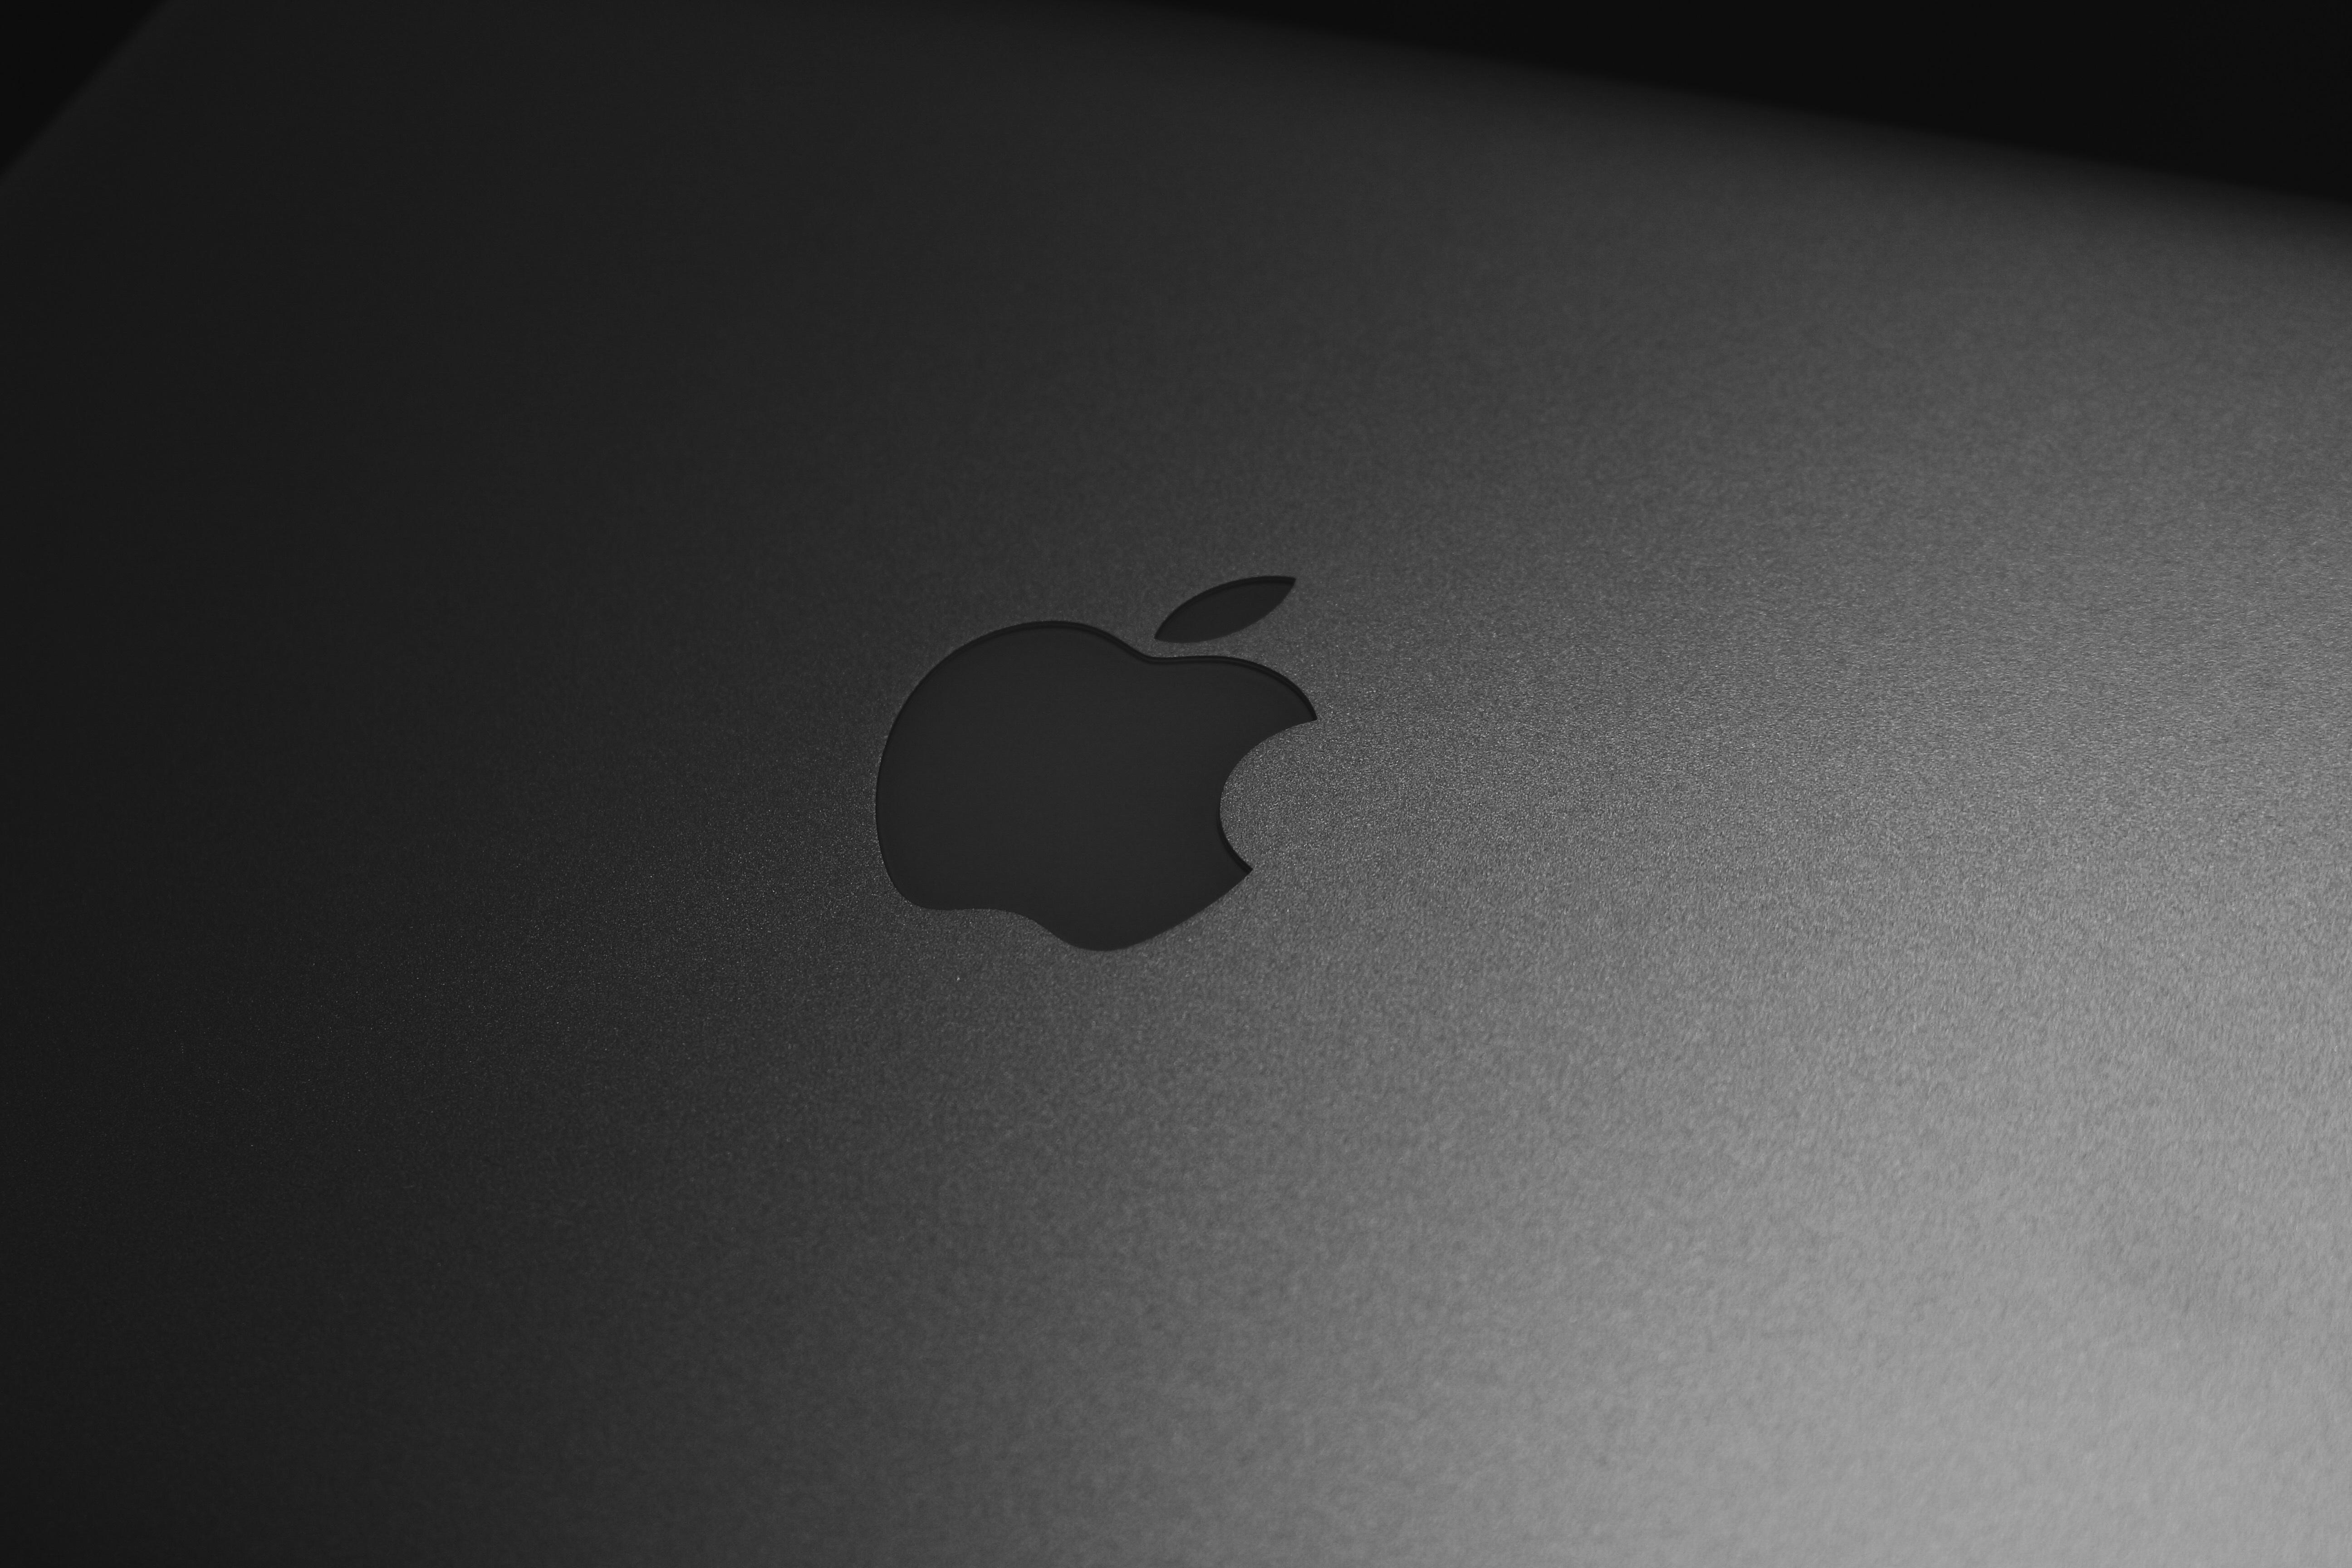 Simple Wallpaper Macbook Light - notebook-macbook-hand-apple-light-black-and-white-white-shadow-darkness-black-monochrome-circle-brand-font-logo-organ-shape-monochrome-photography-computer-wallpaper-877691  Snapshot_526183.jpg